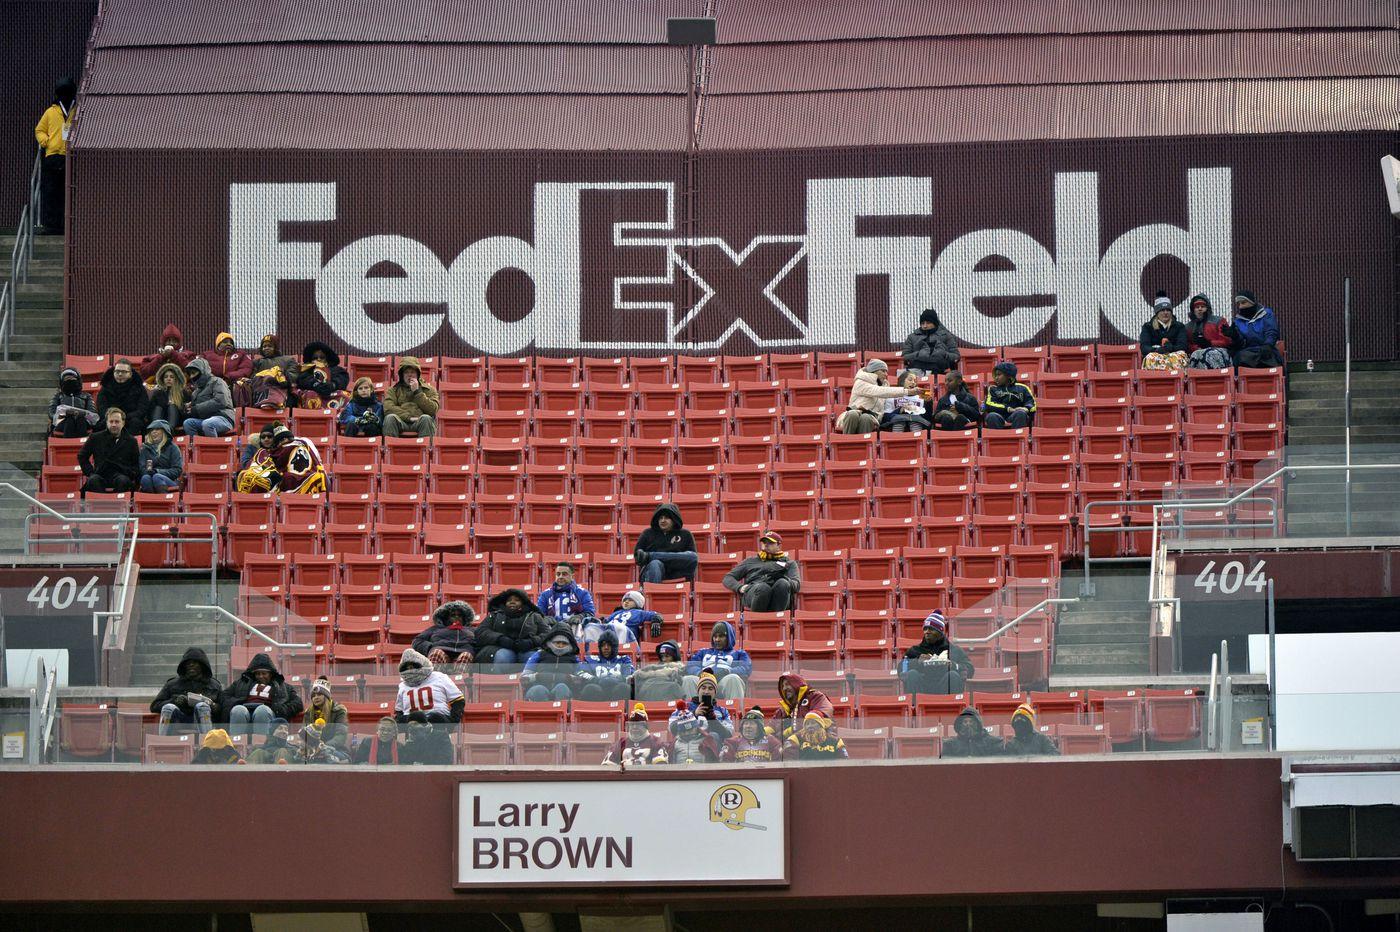 Sponsor FedEx asks Washington's NFL team to change its nickname